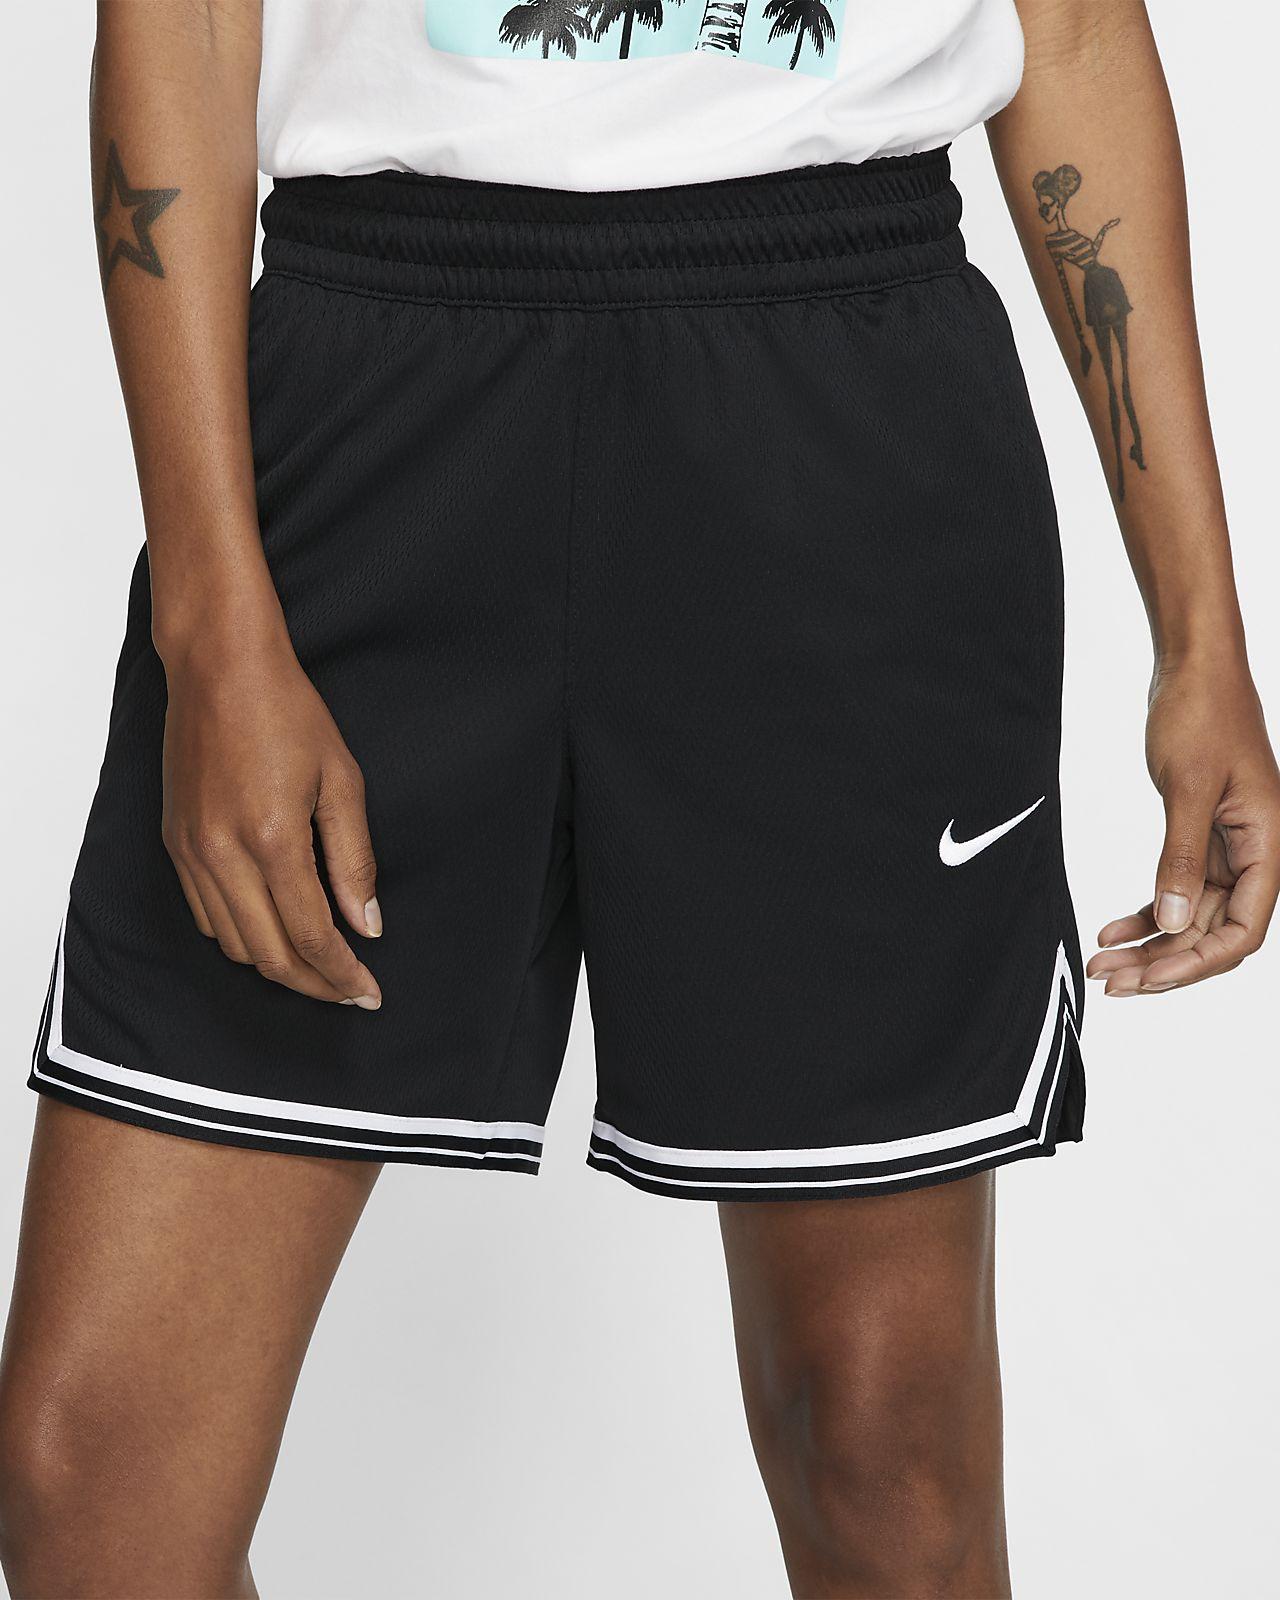 Short de basketball Nike pour Femme